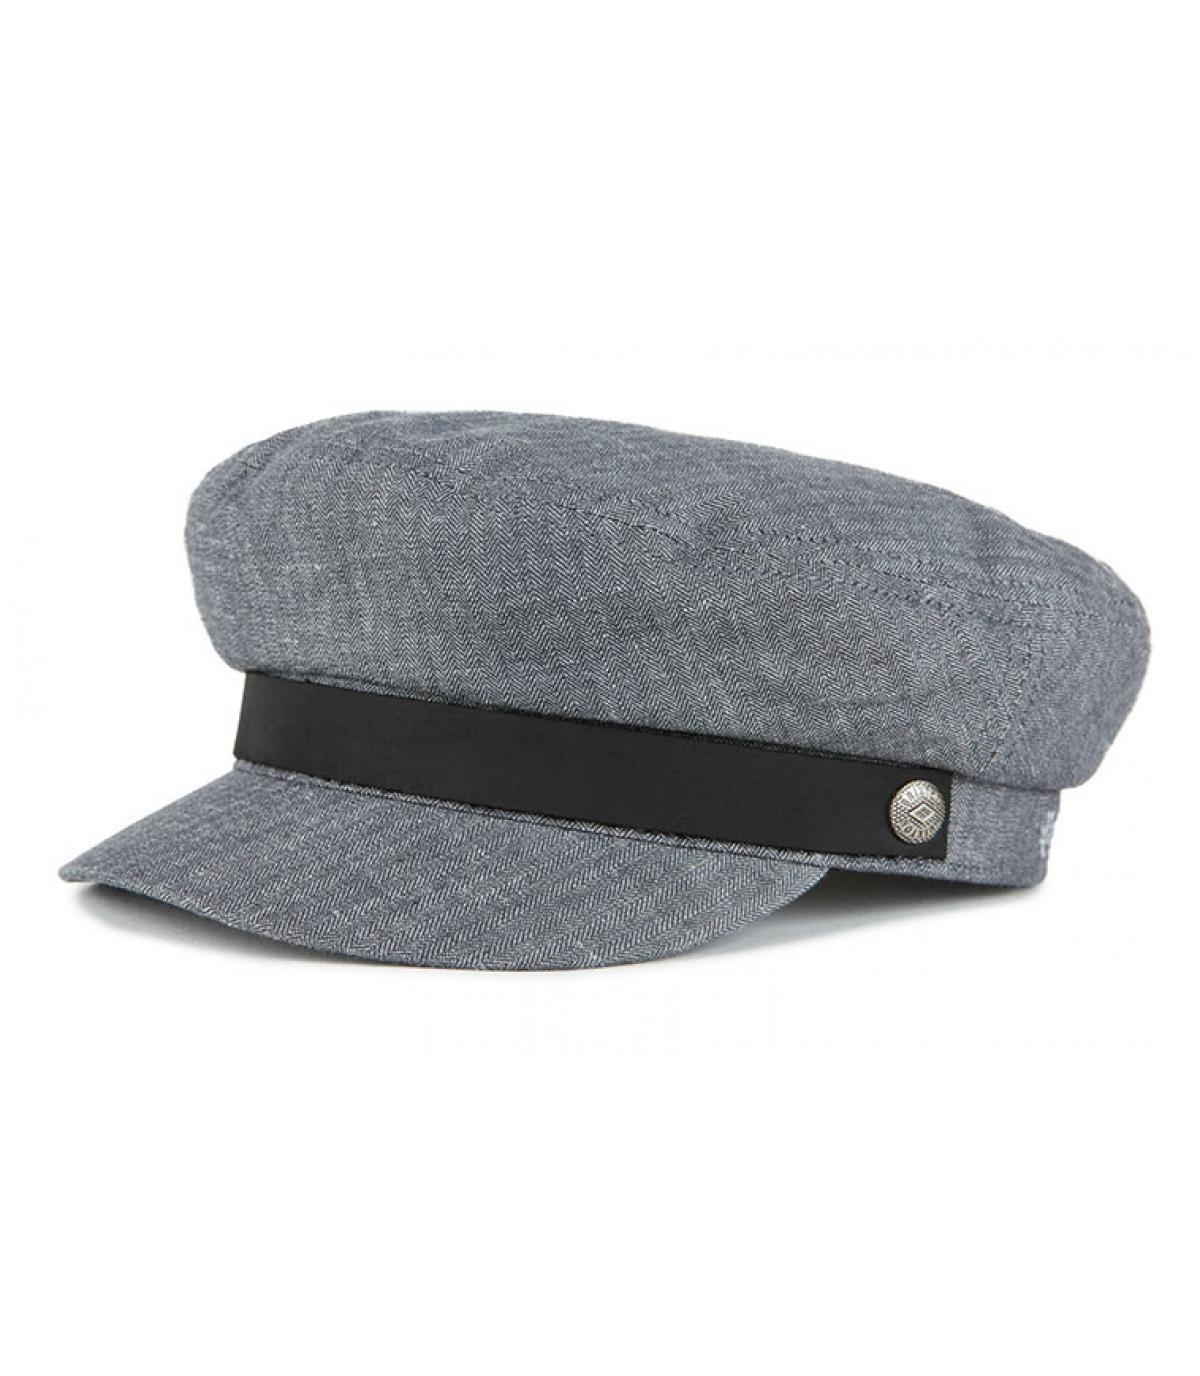 casquette marin femme gris